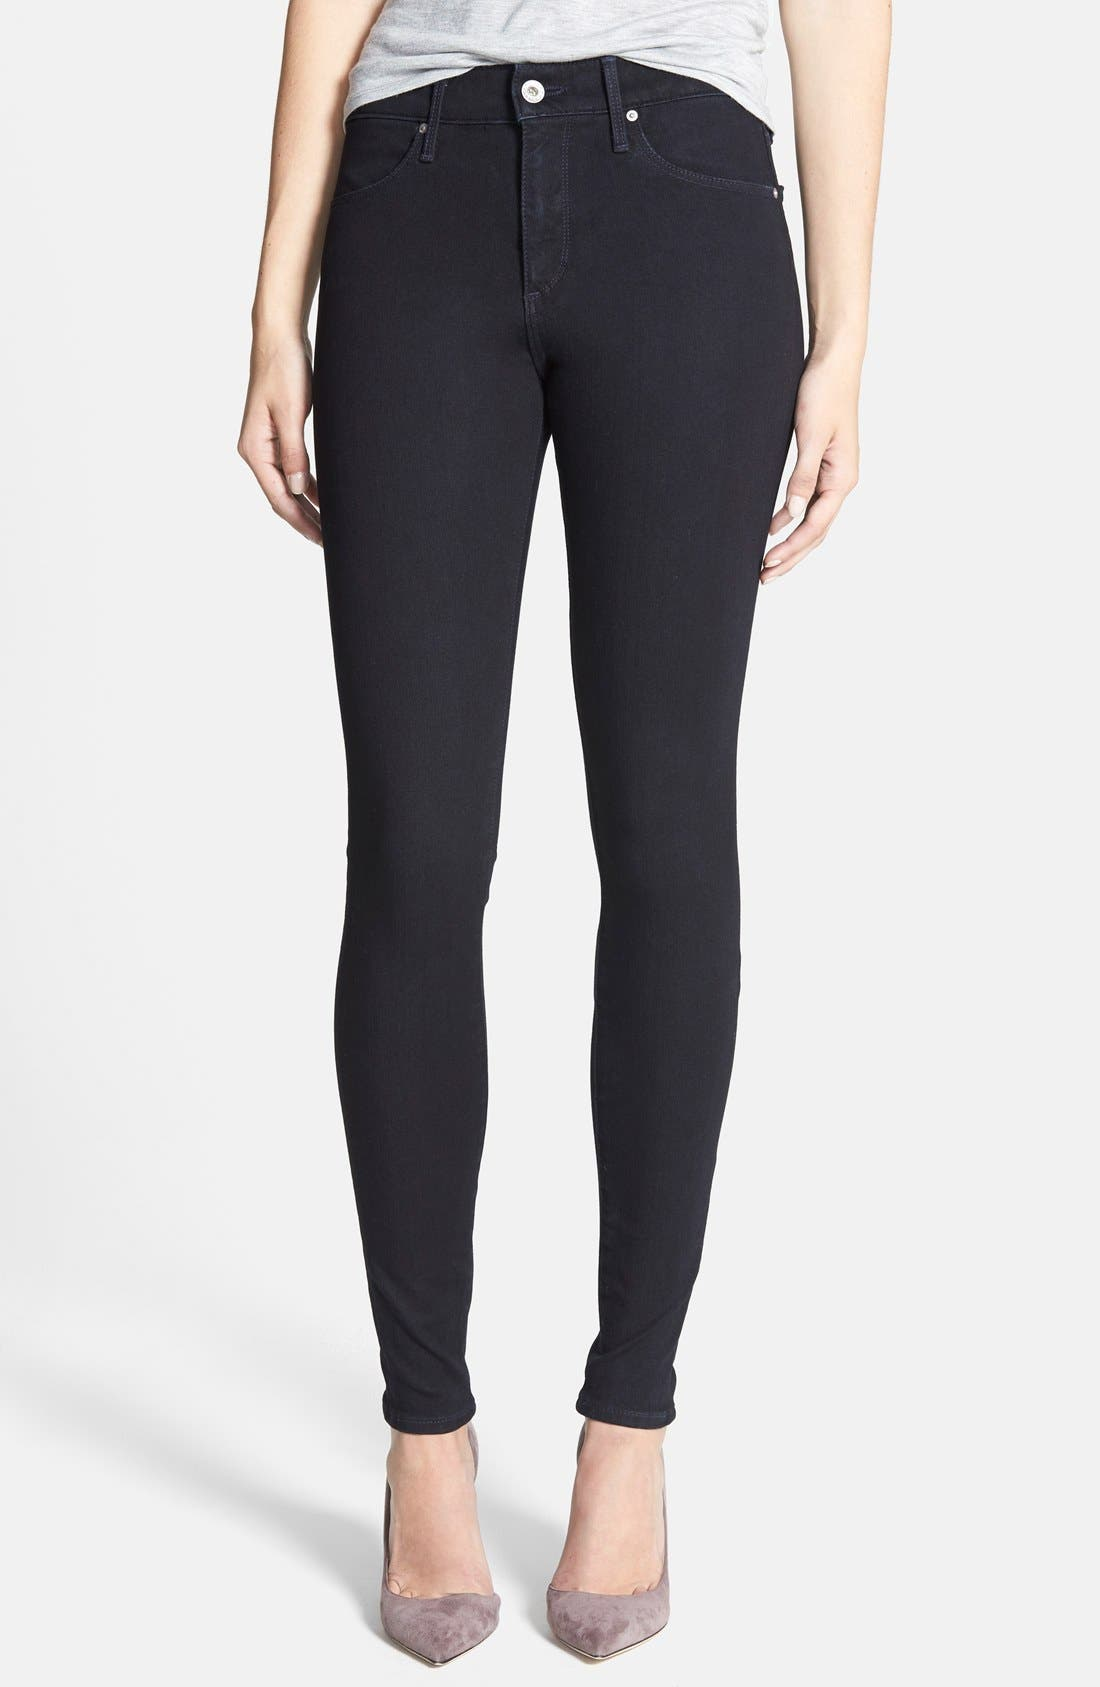 Main Image - AG Contour 360 - Farrah High Waist Skinny Jeans